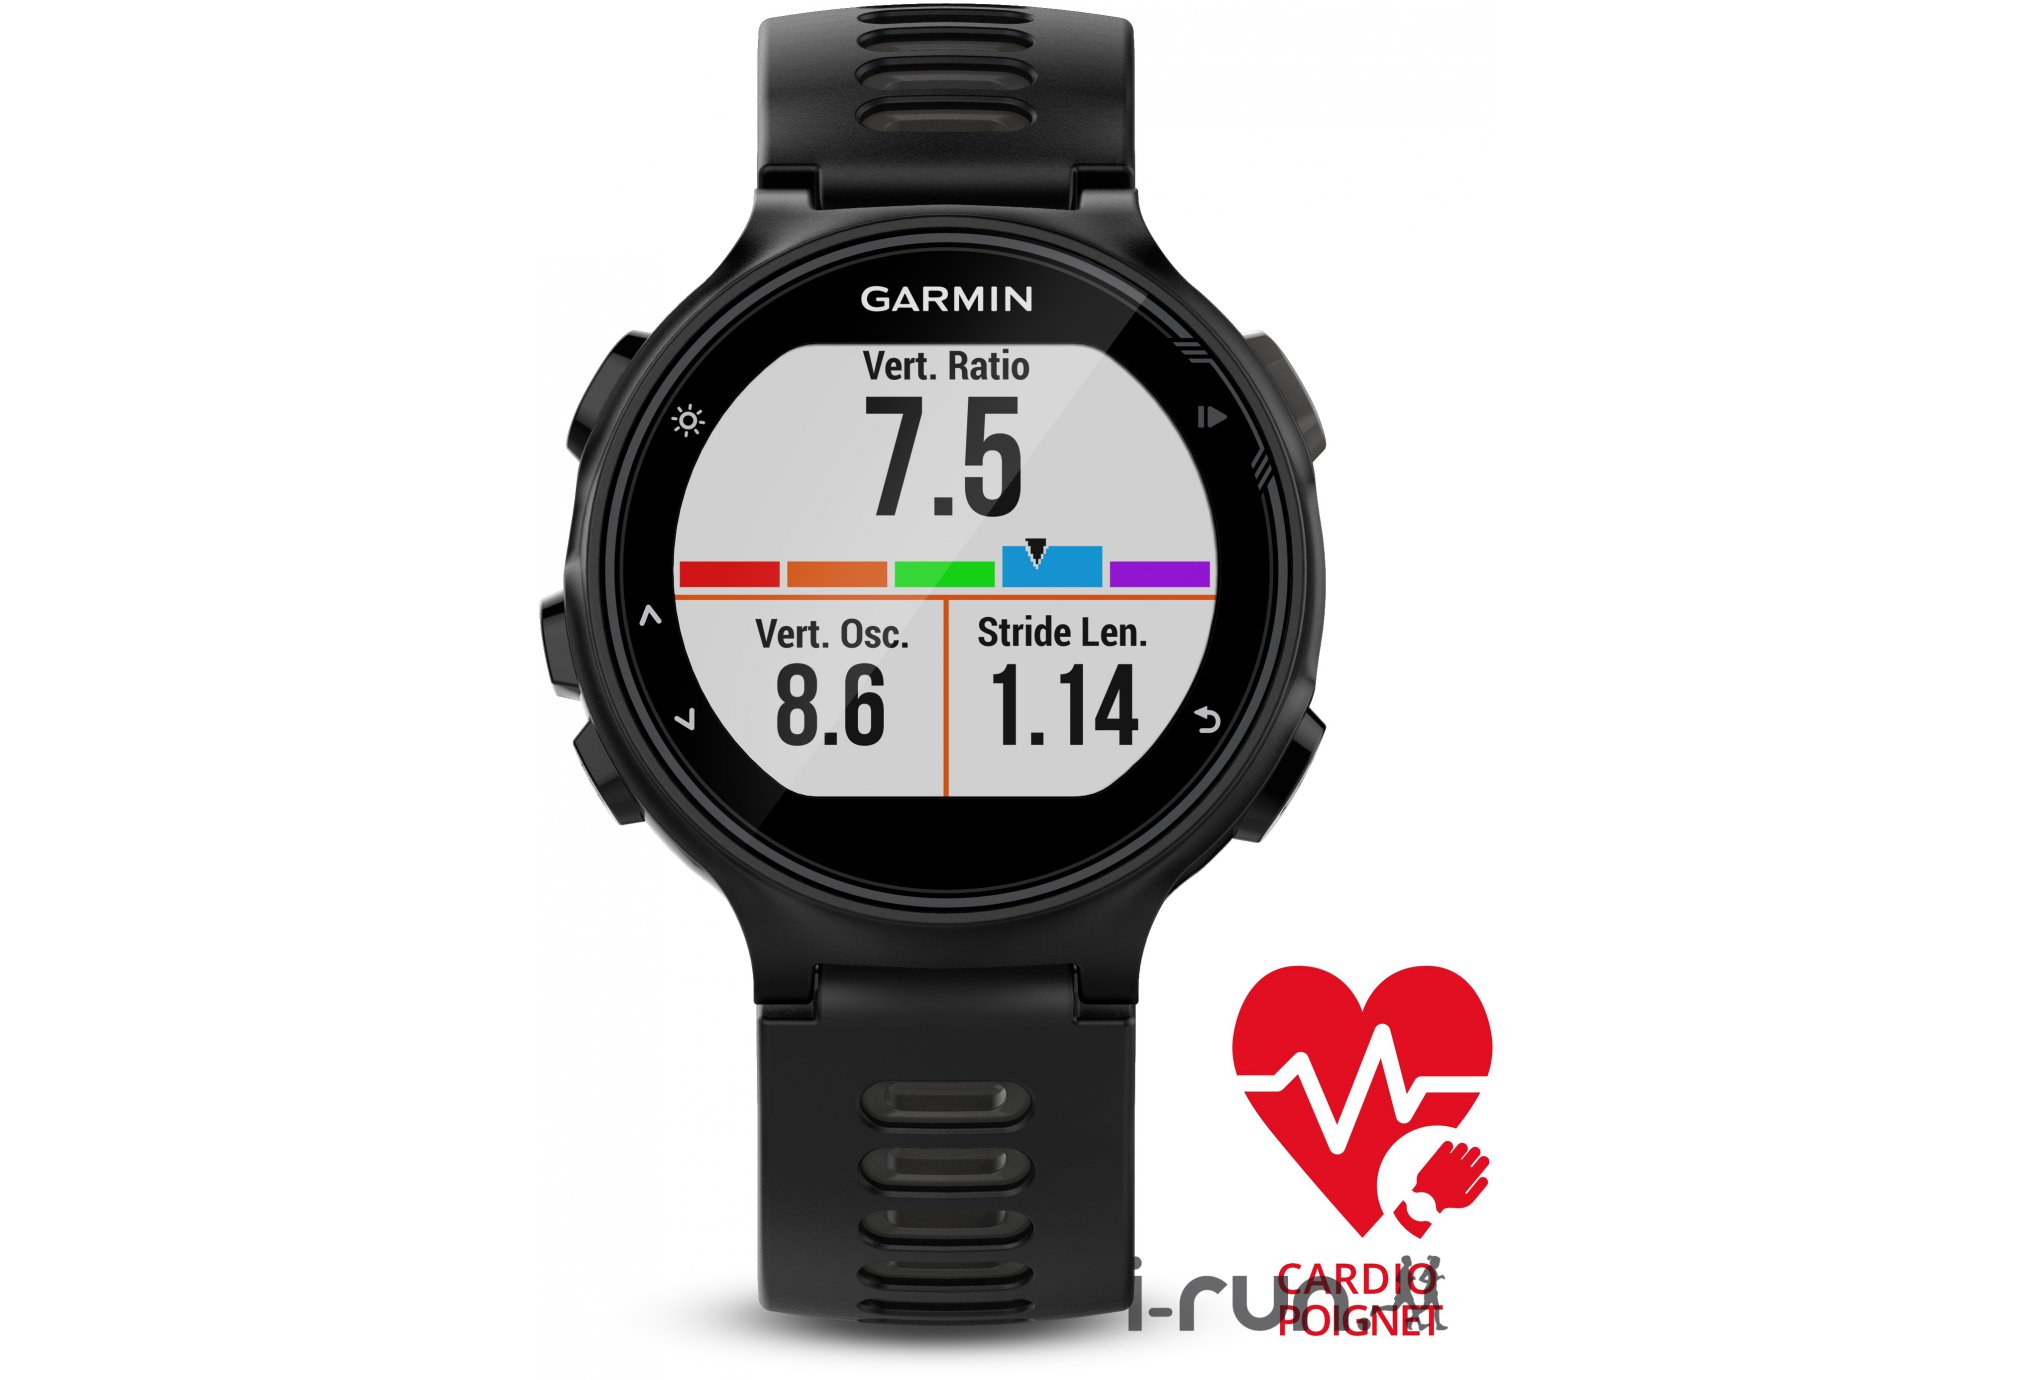 Garmin Forerunner 735xt tri-Bundle cardio-gps